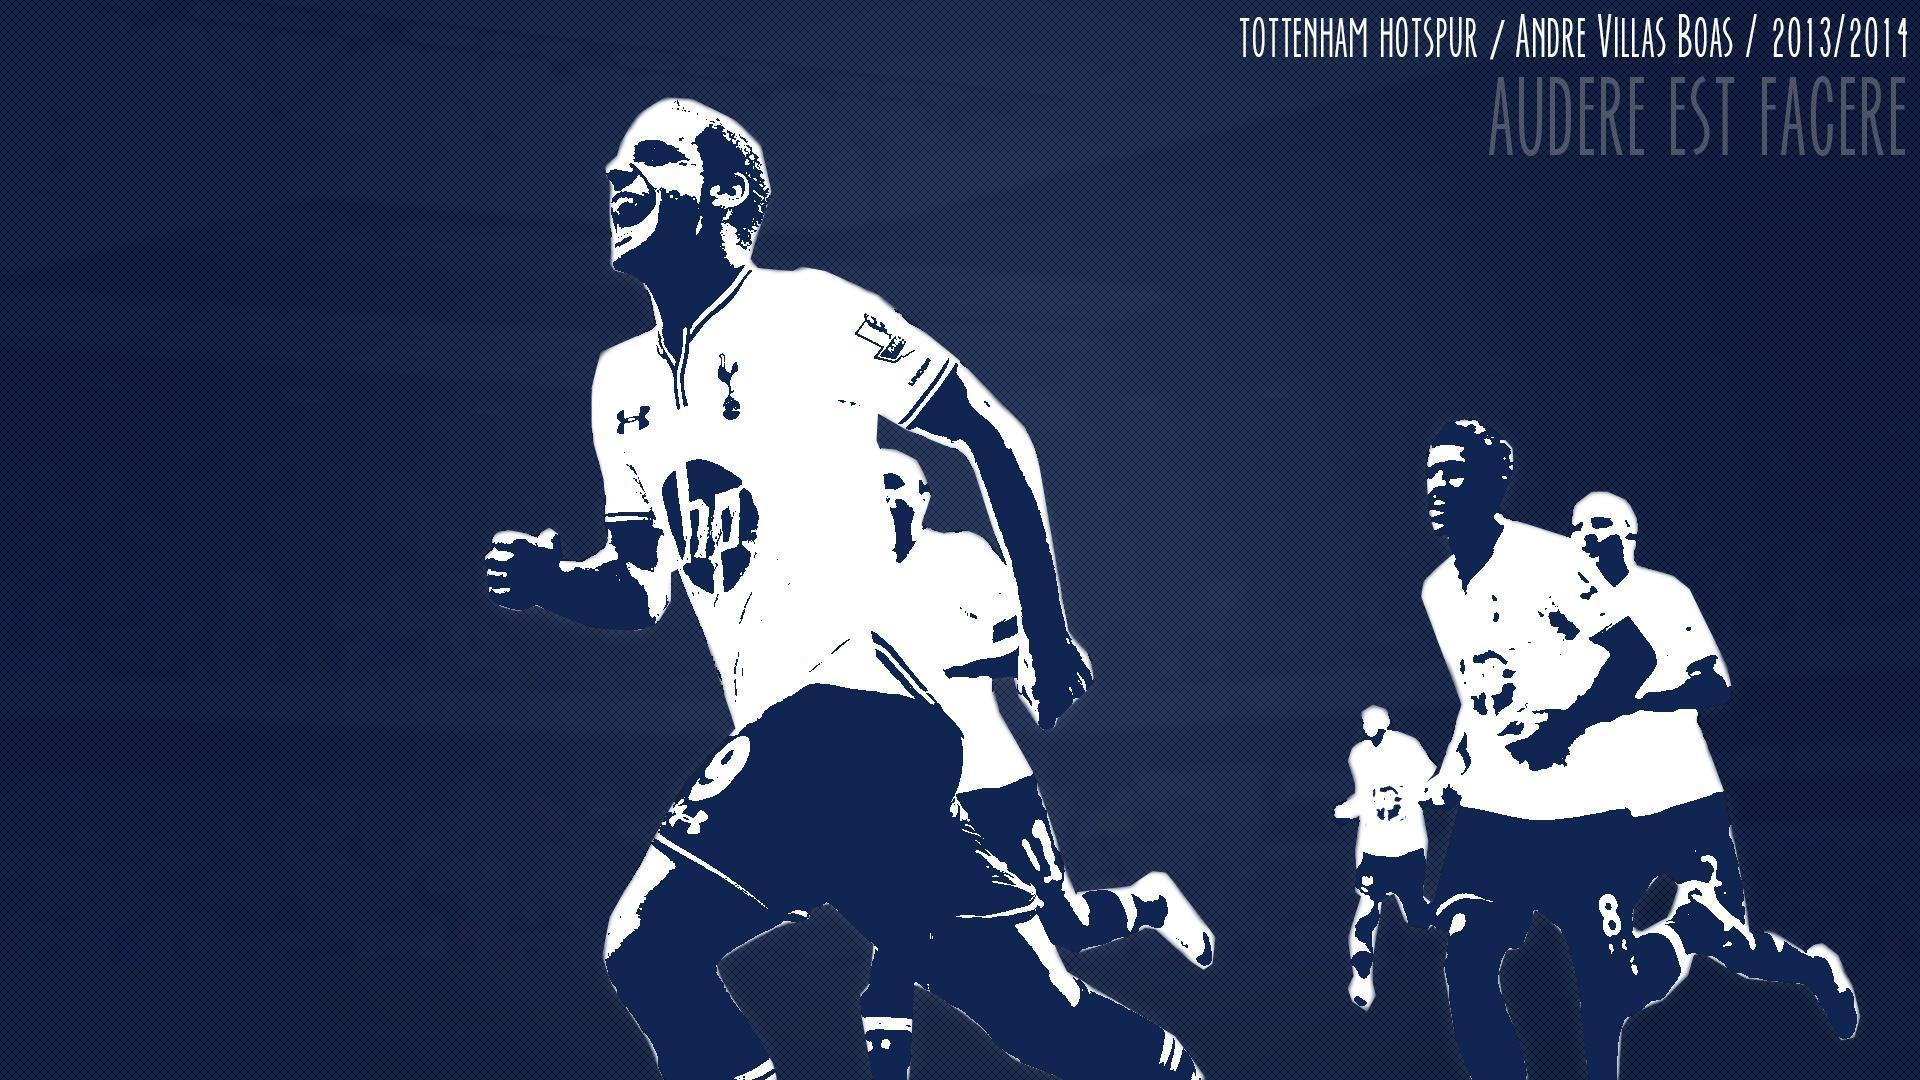 Tottenham Hotspur F.C. Teams Background 6